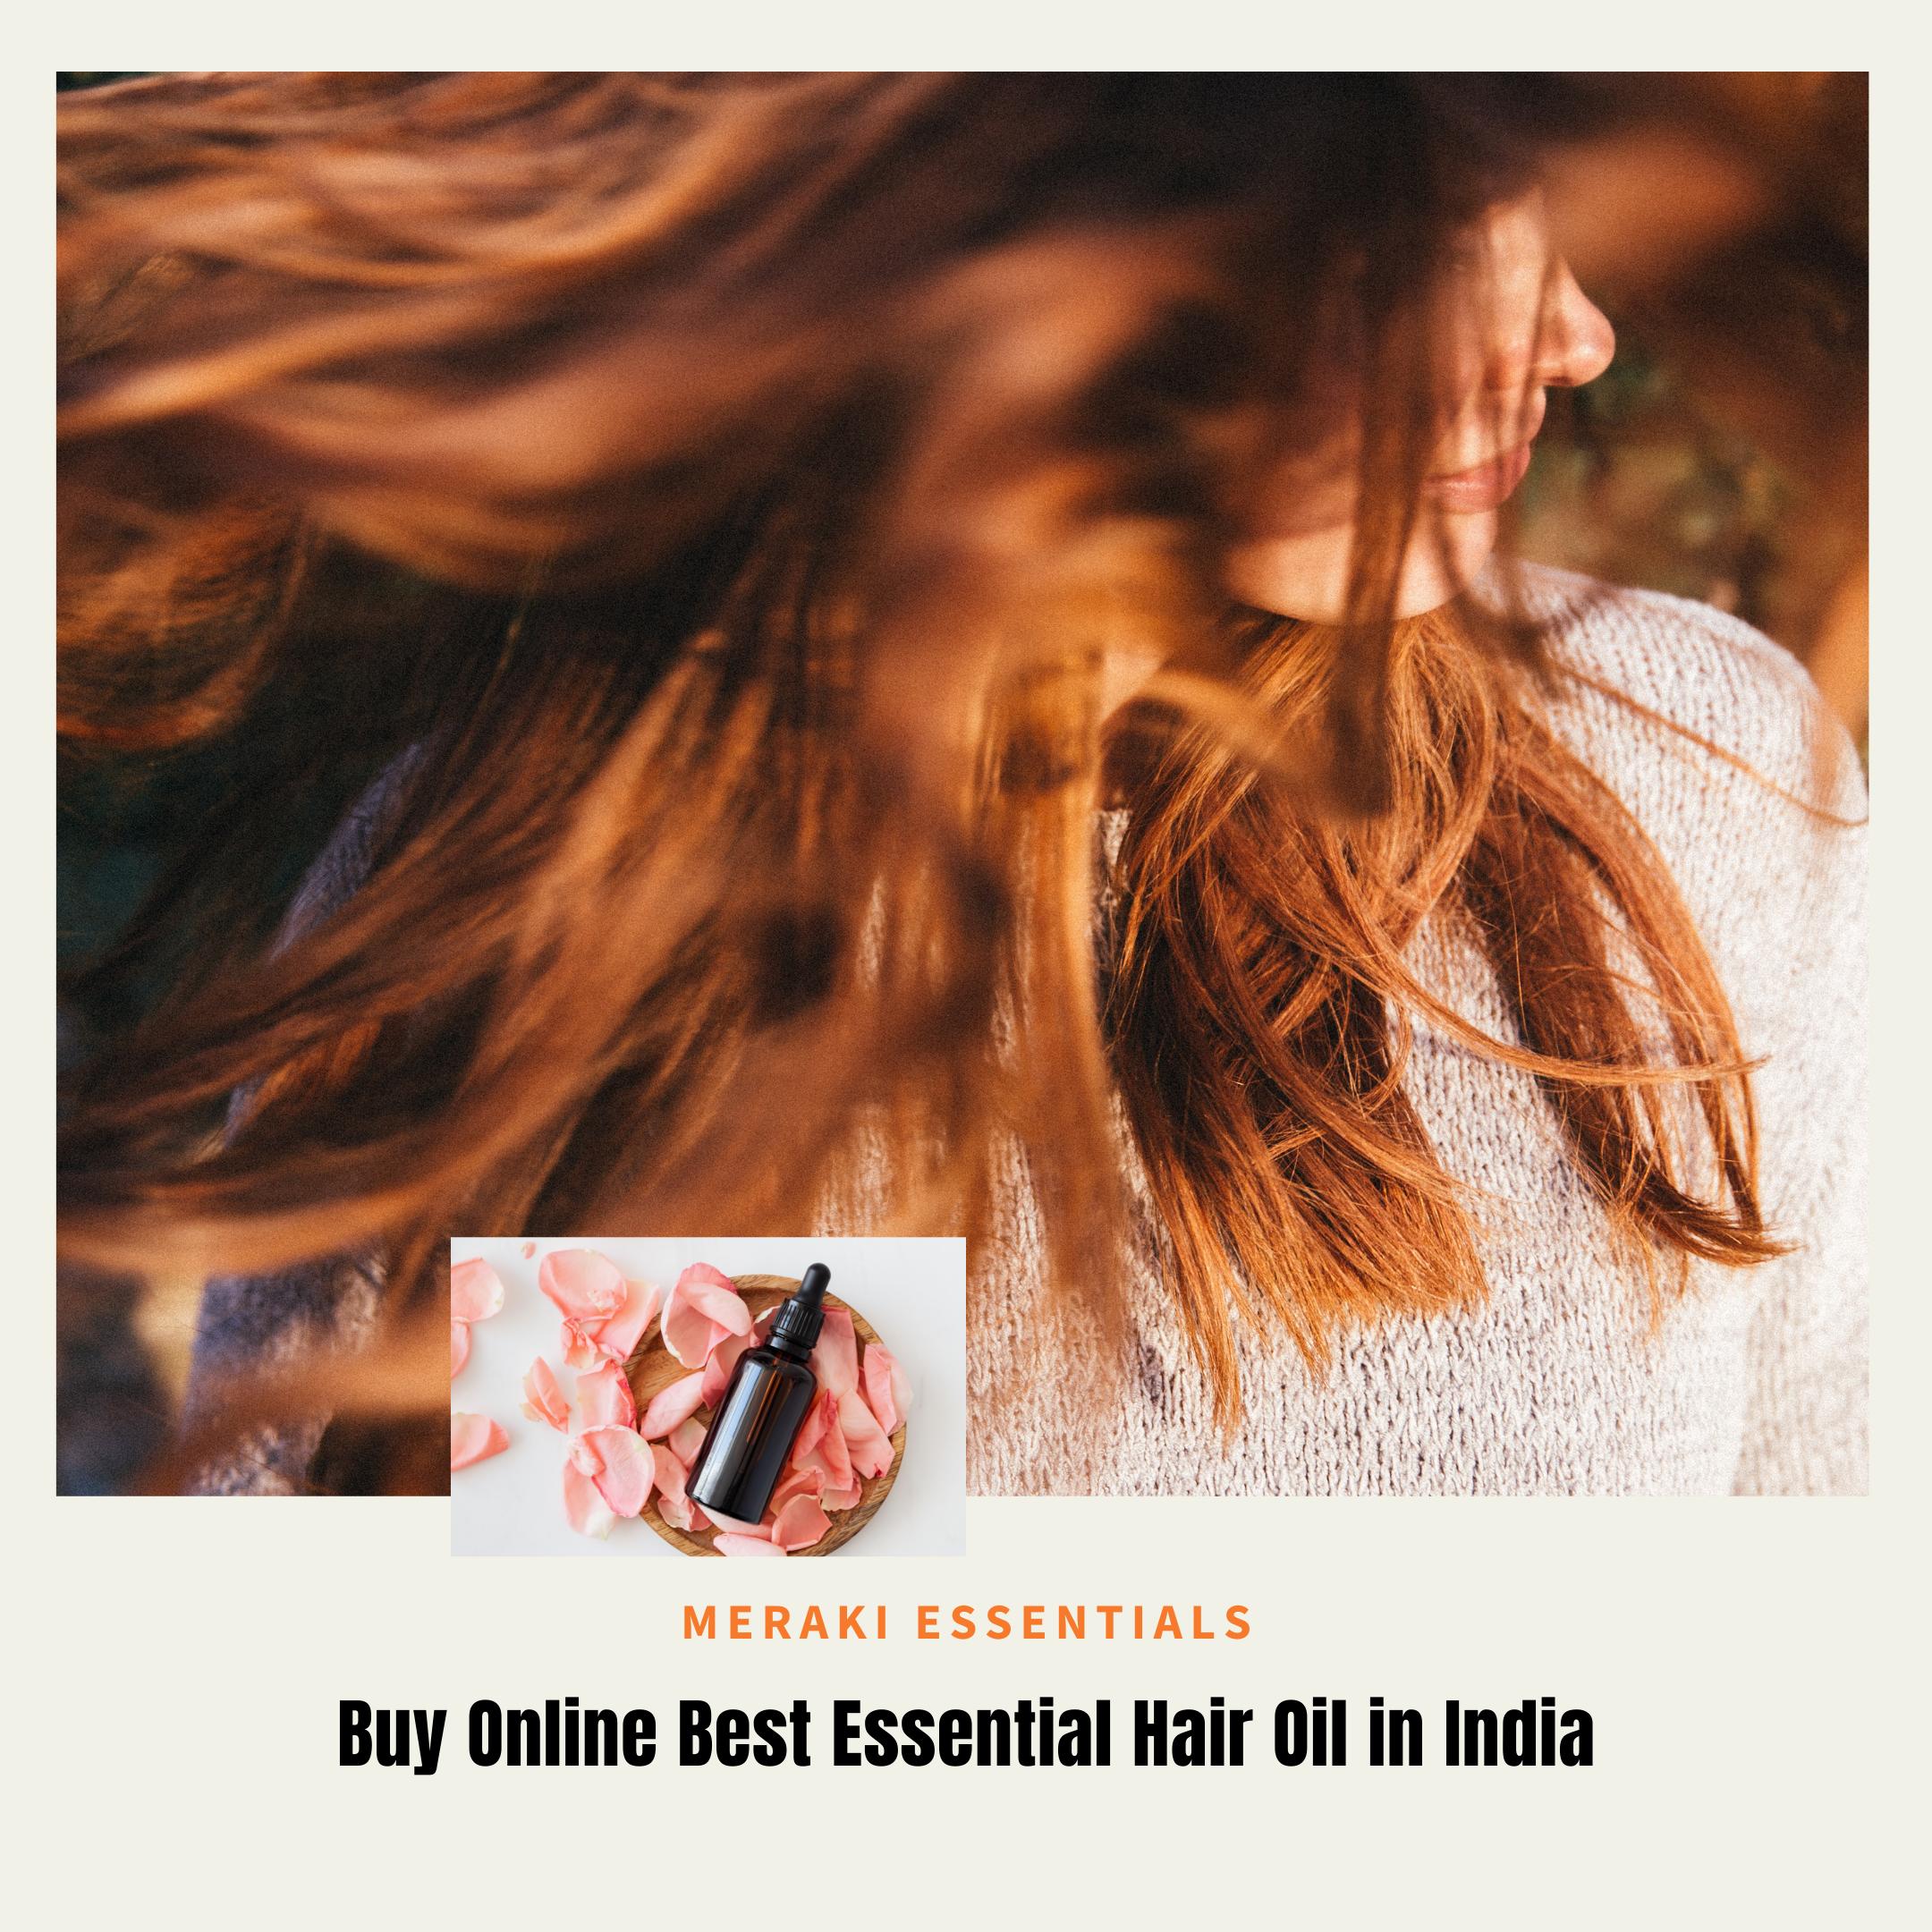 Buy Online Best Essential Hair Oil at Best Price in India